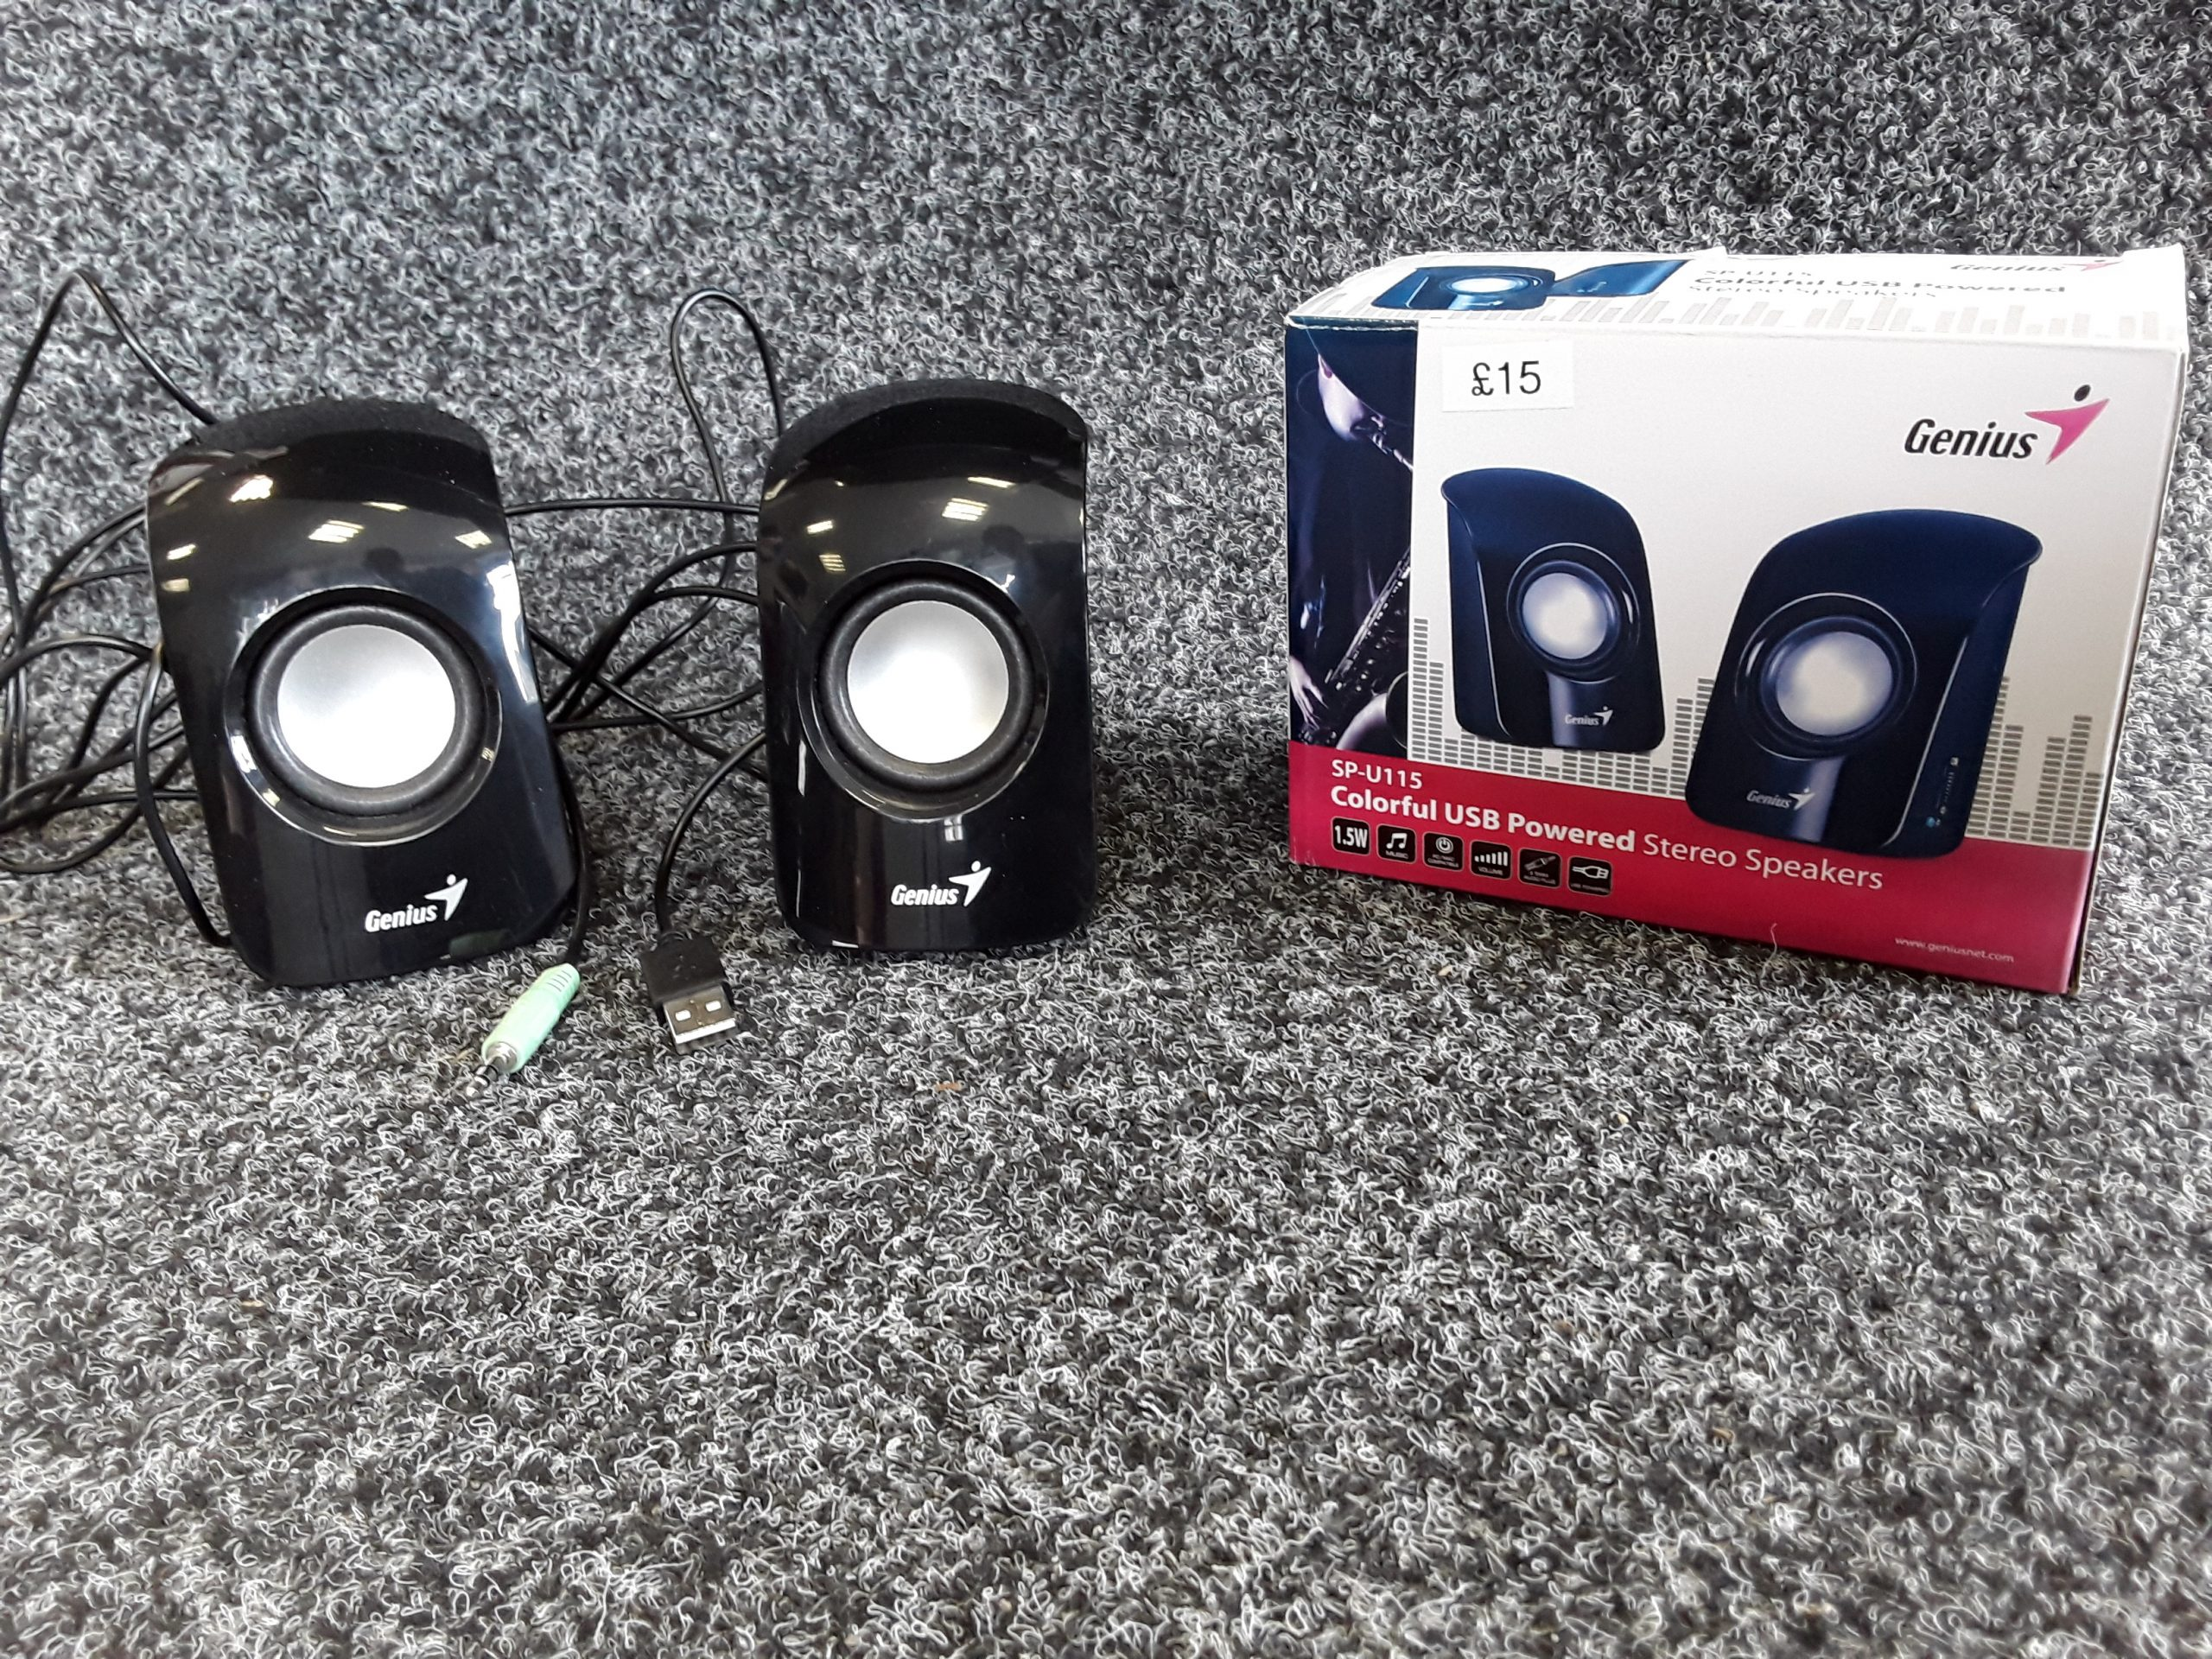 Genius Wired Speaker Duo #2